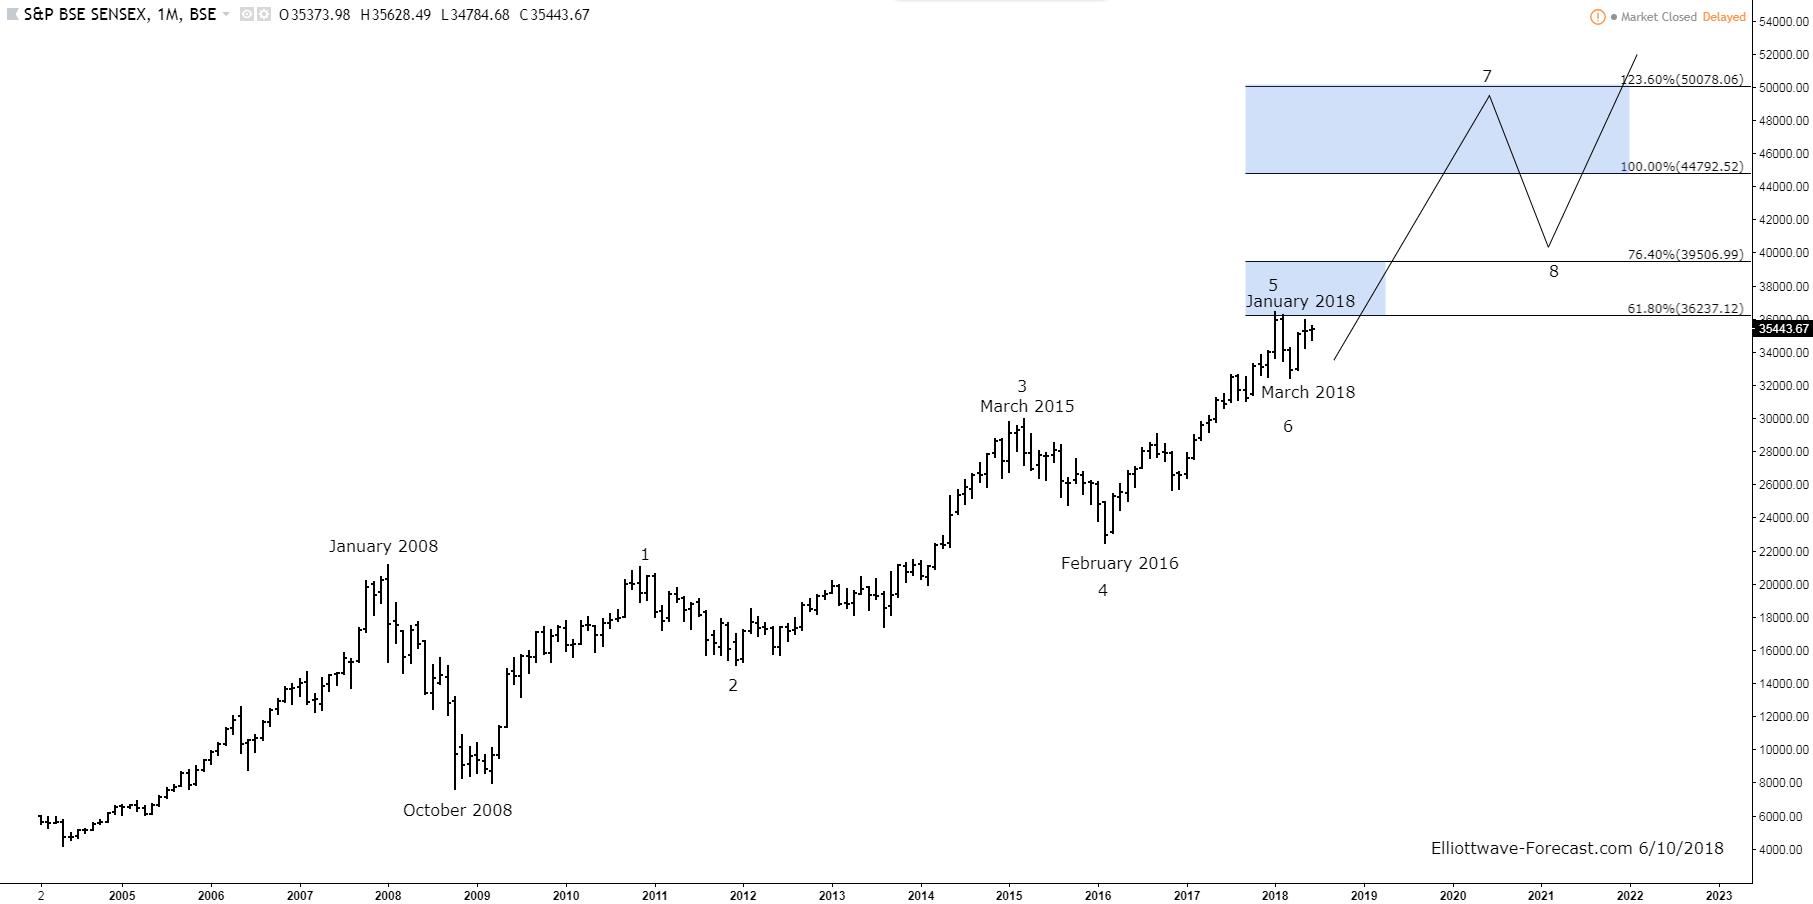 The Sensex Index Long Term Bullish Cycles